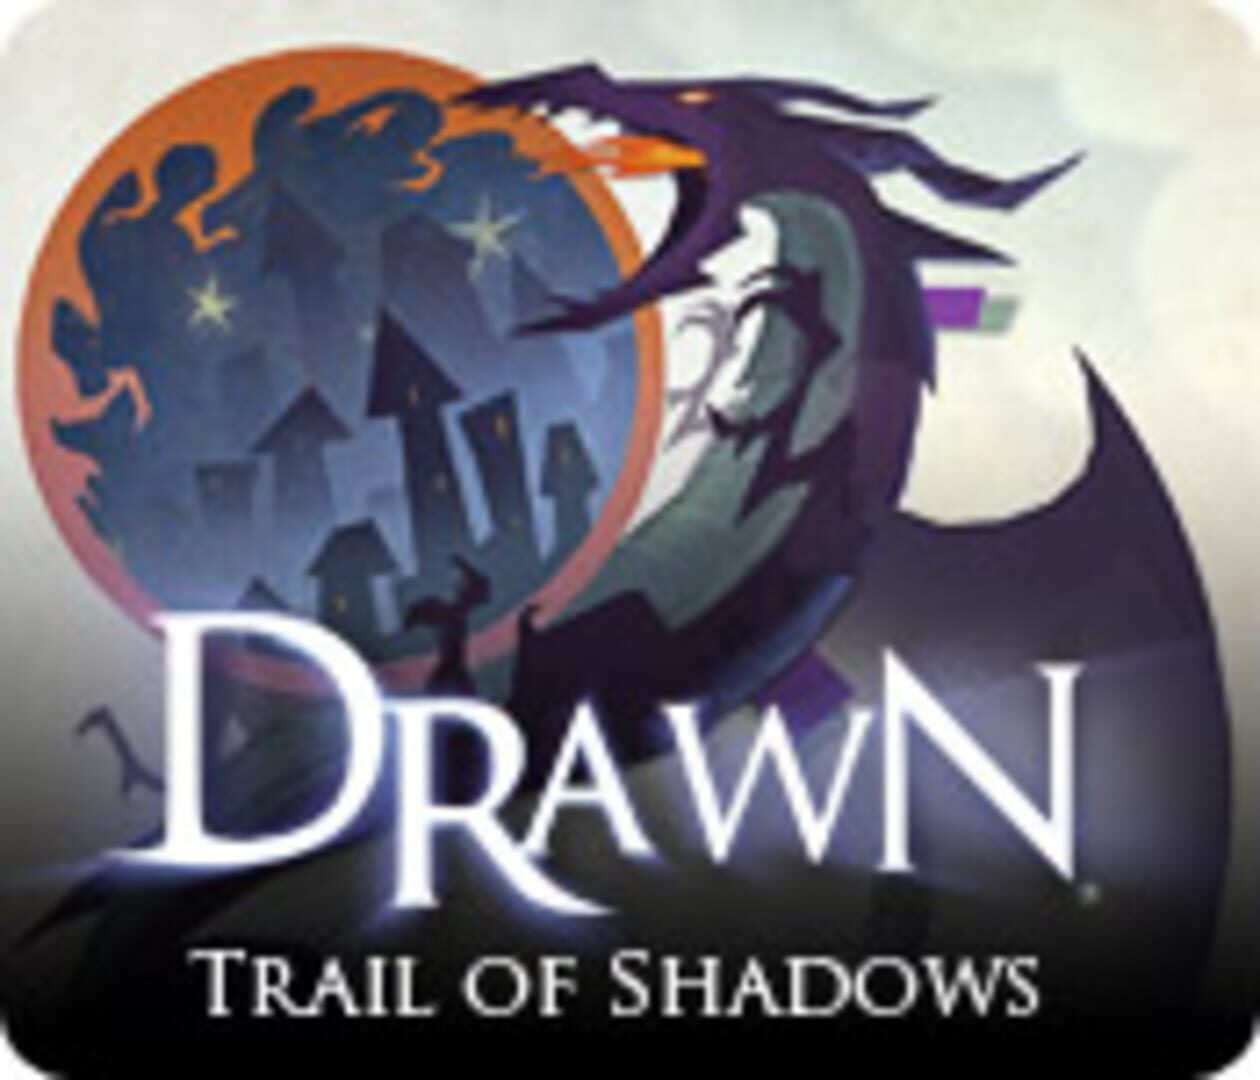 buy Drawn: Trail of Shadows cd key for all platform